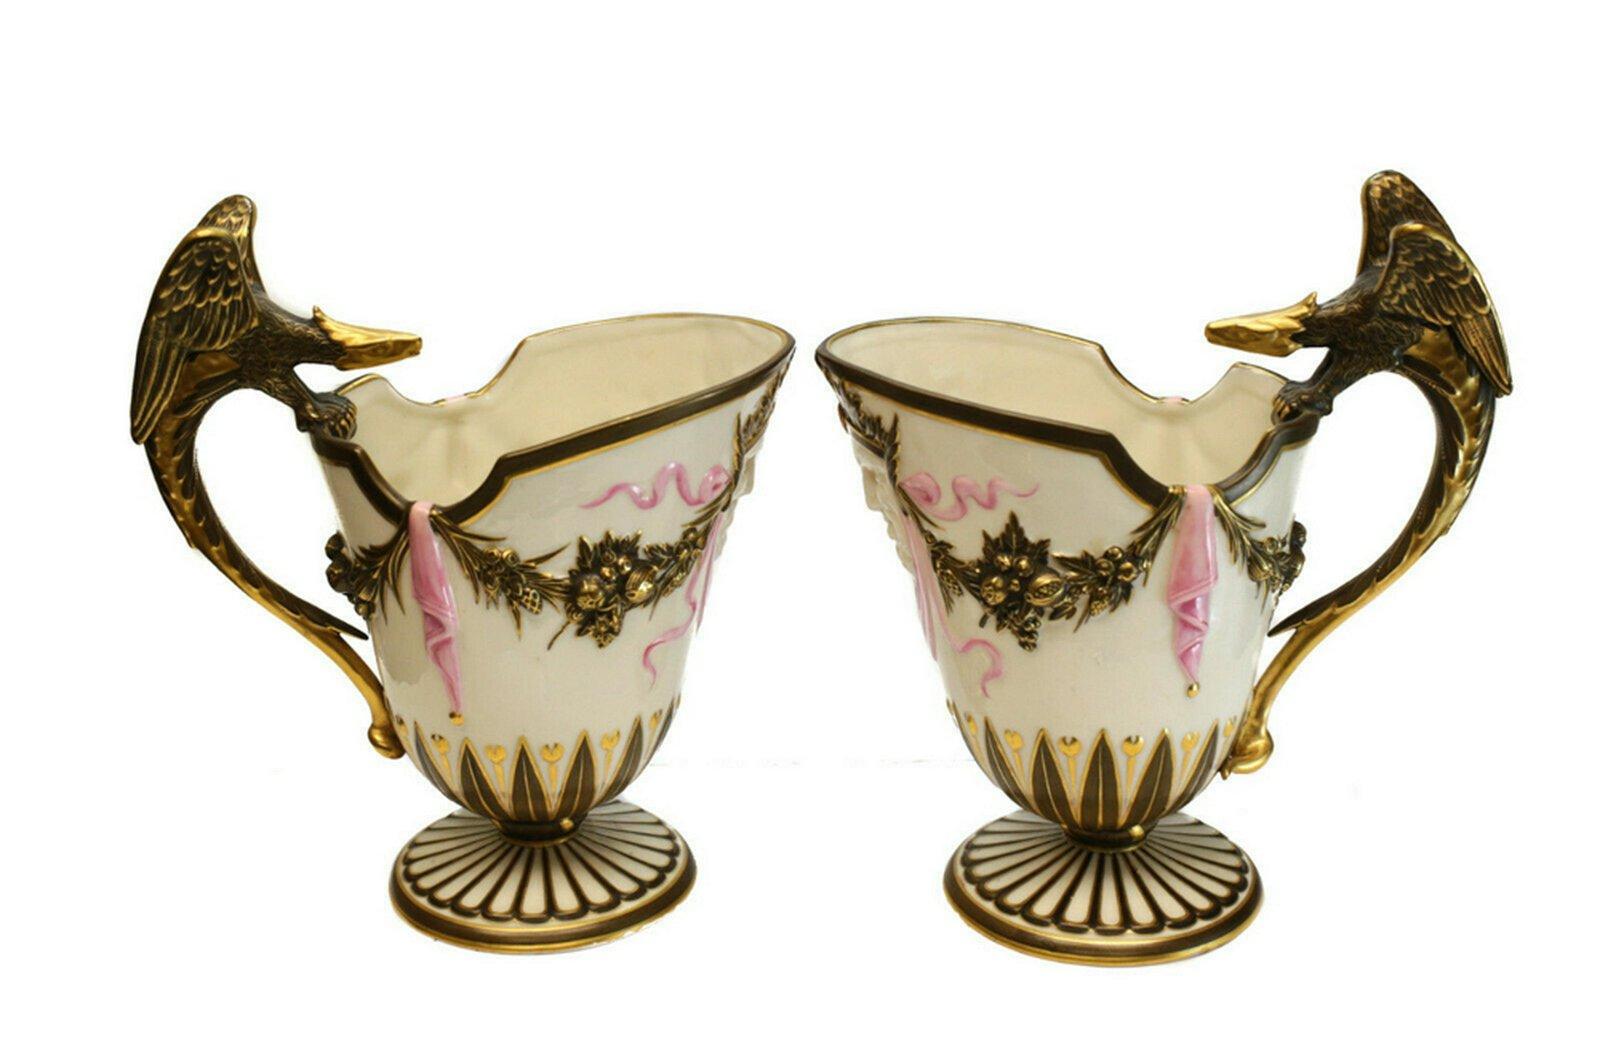 Royal Worcester Porcelain Pitchers 1868, Dragon Handles